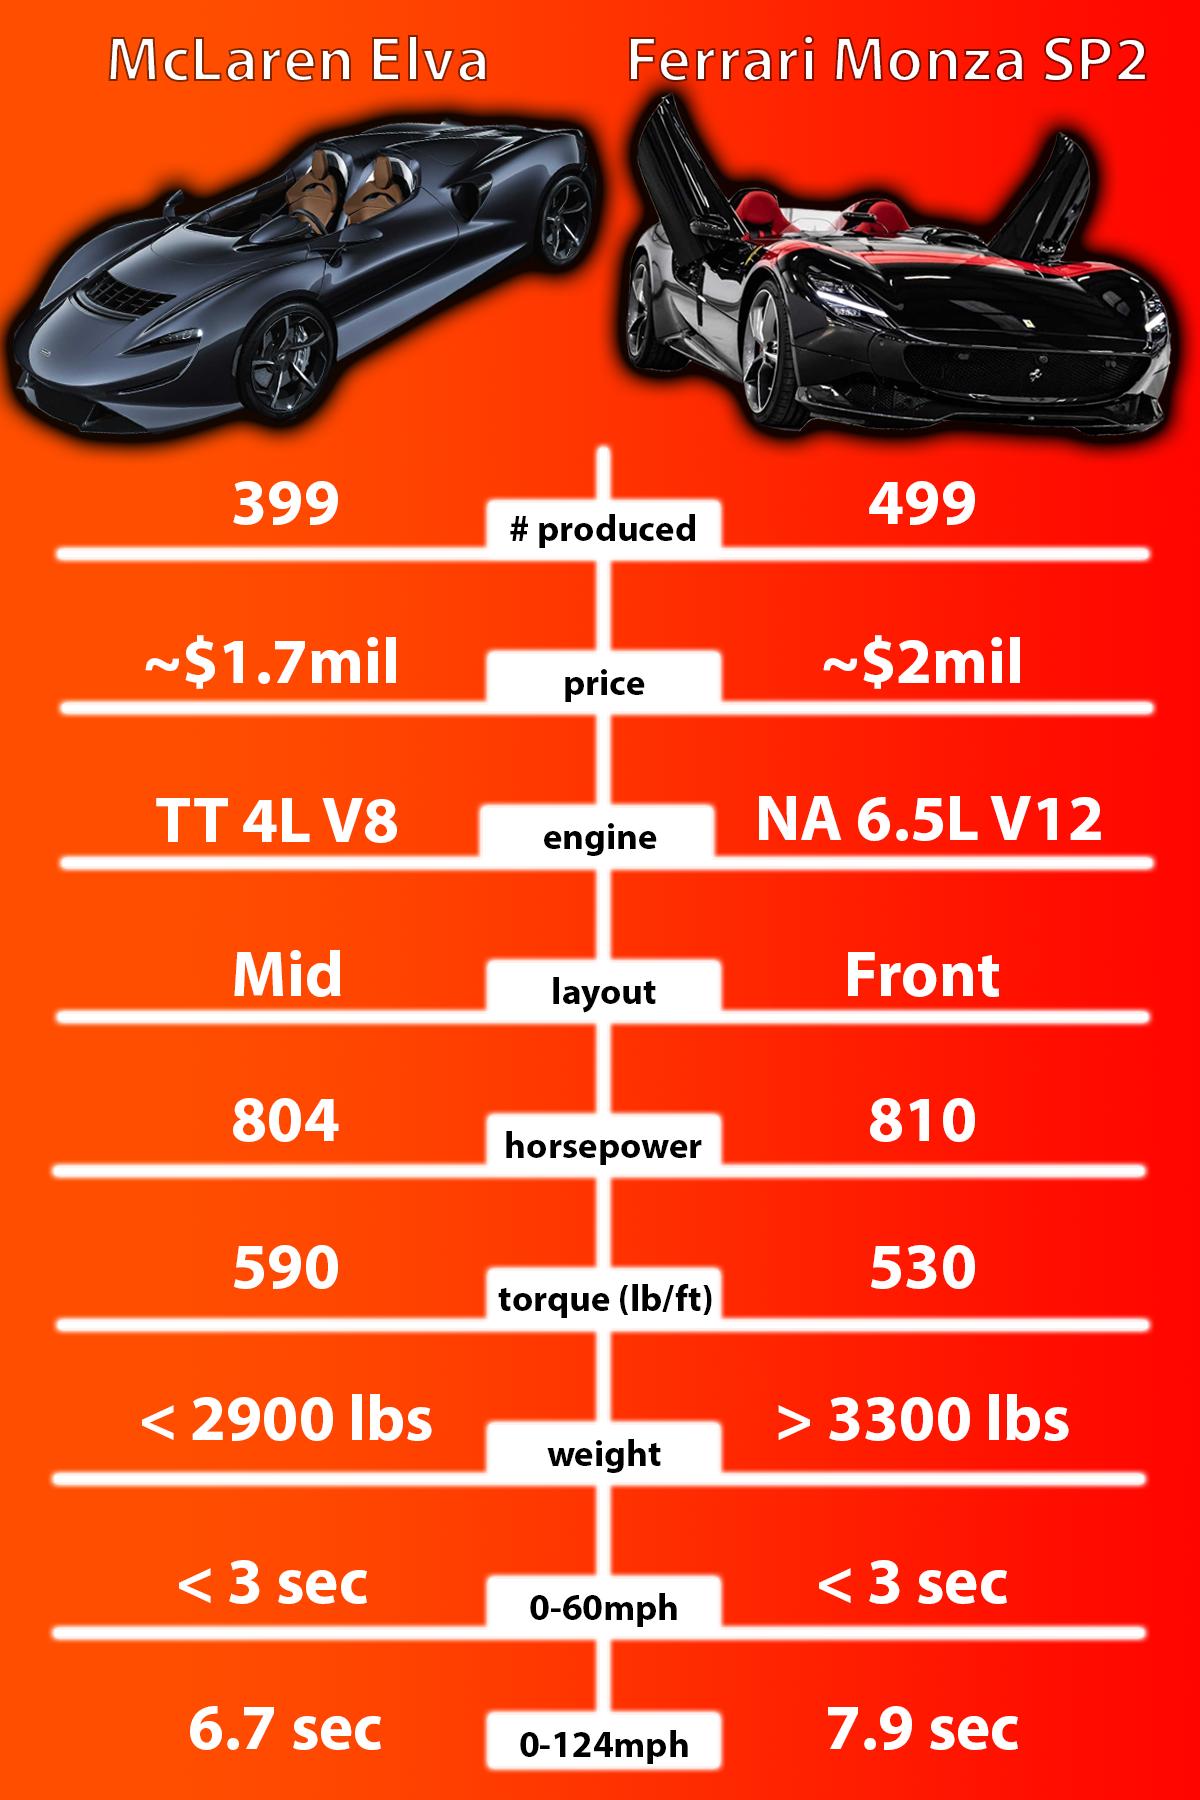 chart comparing specs